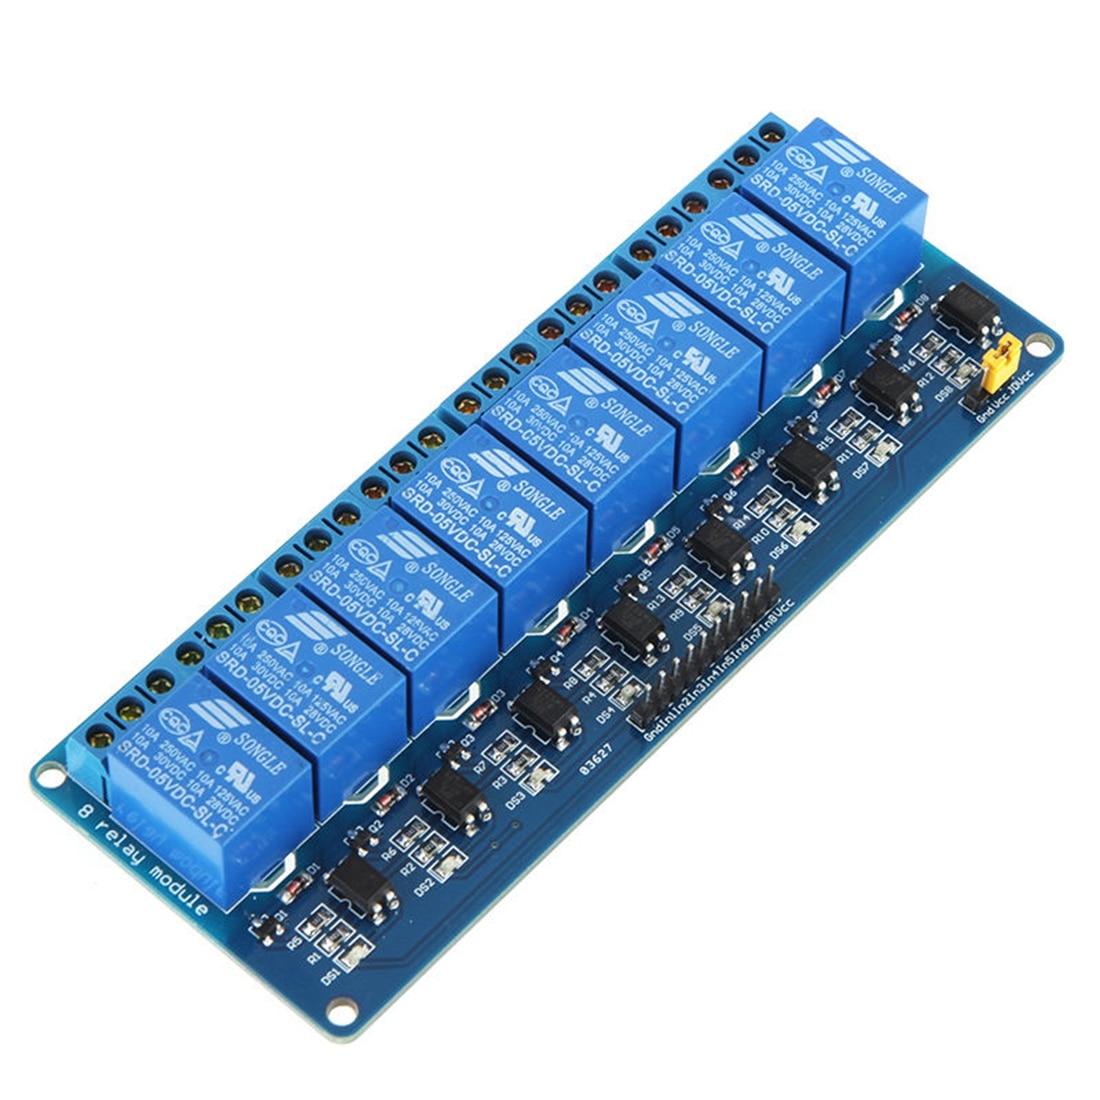 цена на 5V 8 Channel Relay Module Board For Arduino AVR PIC MCU DSP ARM